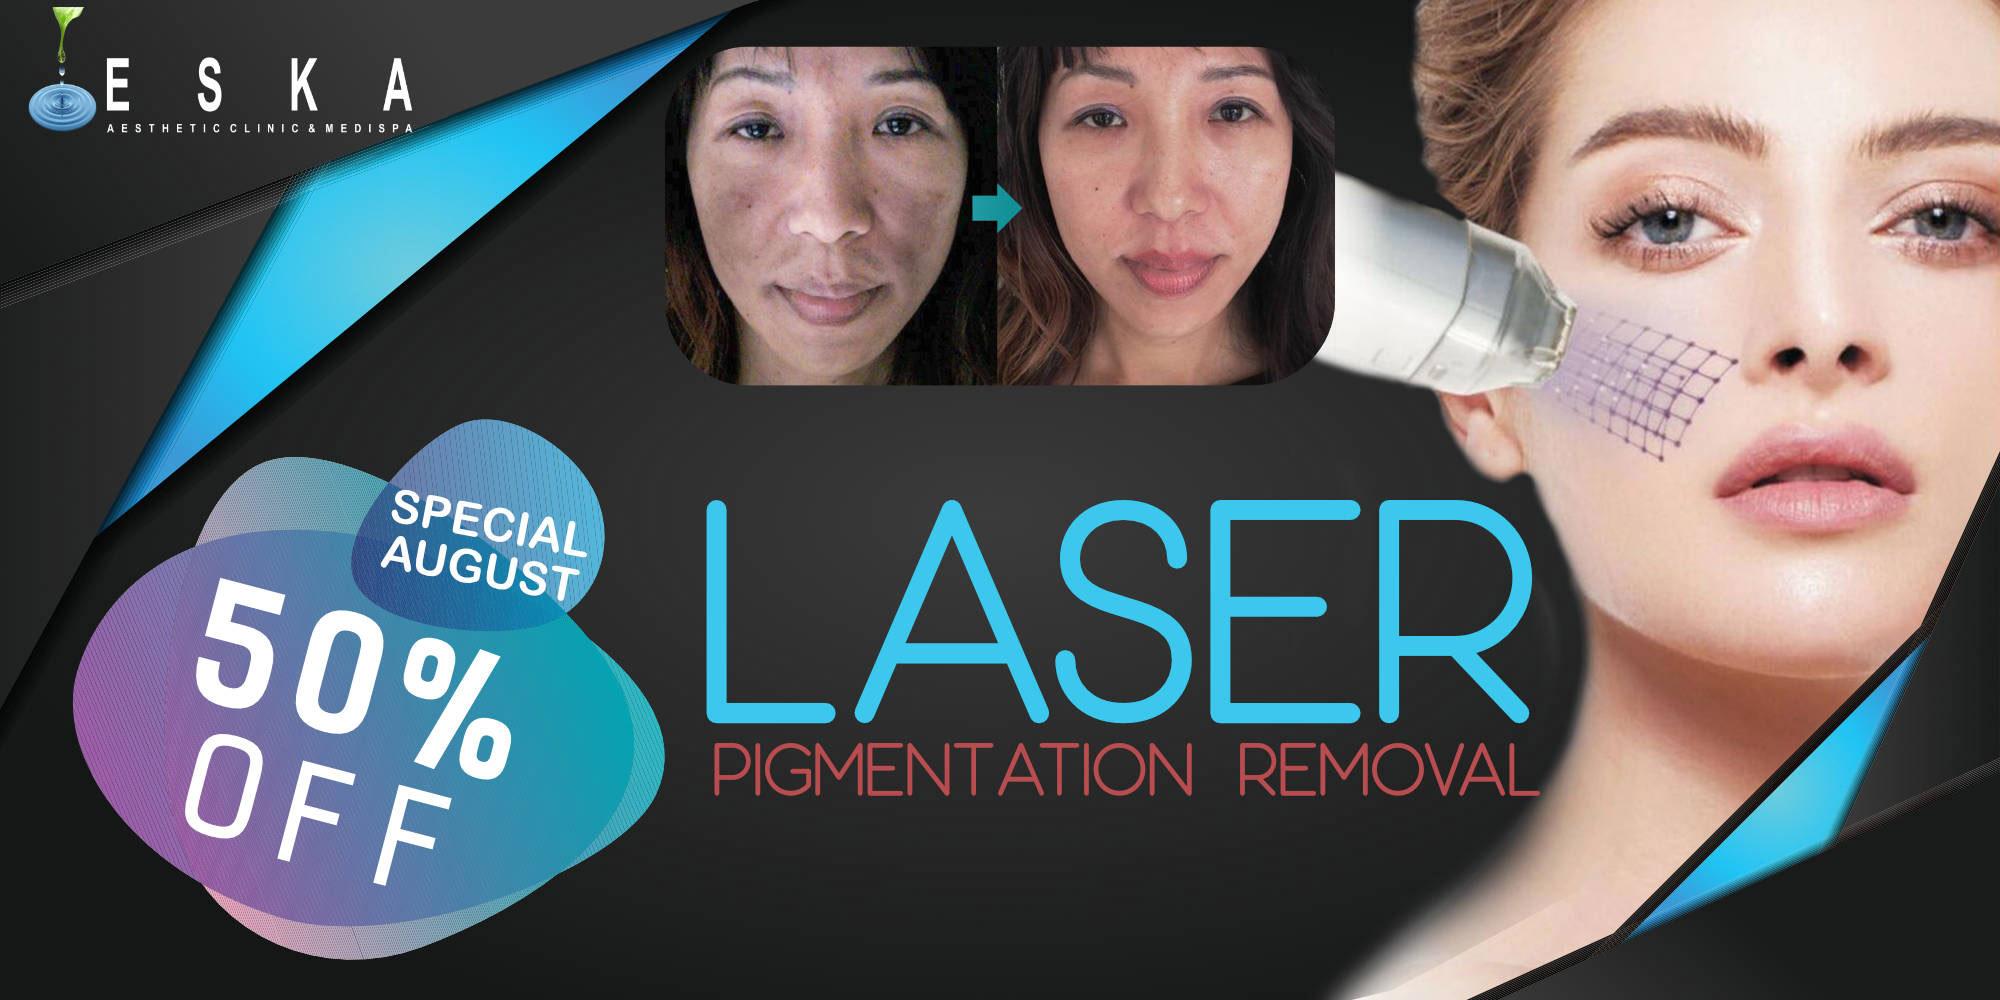 eska group batam eska aesthetic clinic & medispa promo-180801-laser-pigmentation-removal-special-aug-50-%-discount-promo